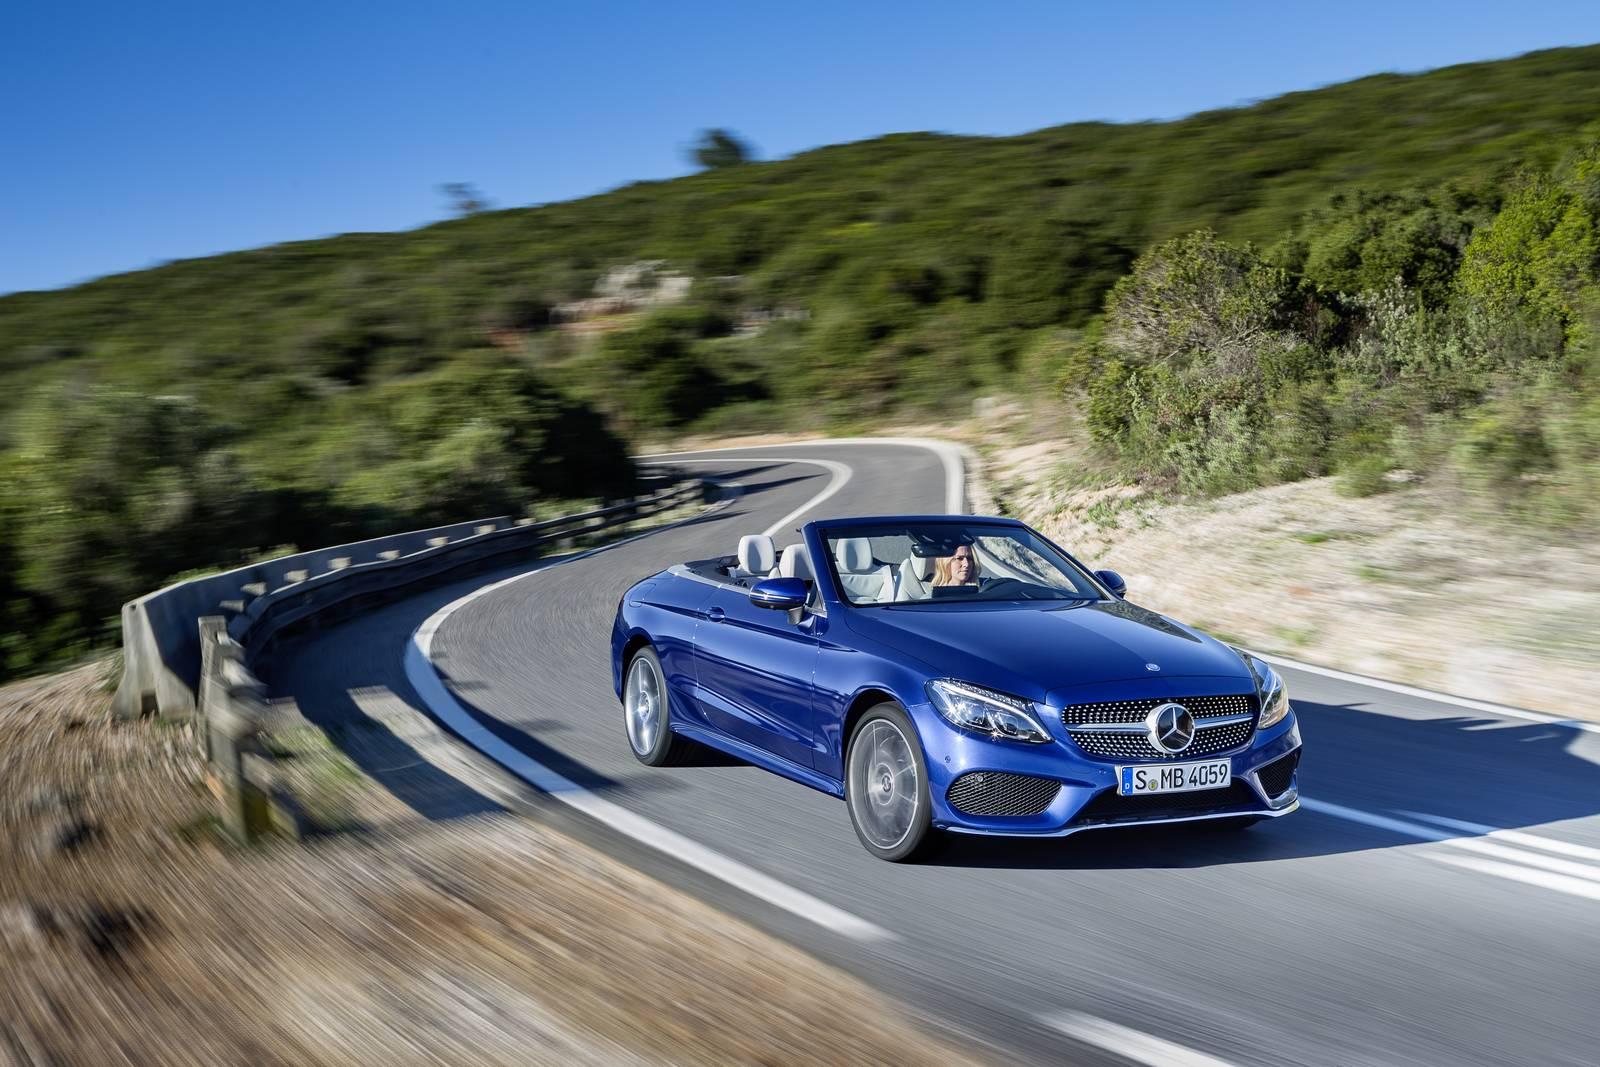 https://storage.googleapis.com/gtspirit/uploads/2016/02/Mercedes-Benz-C-Class-Cabriolet-3.jpg